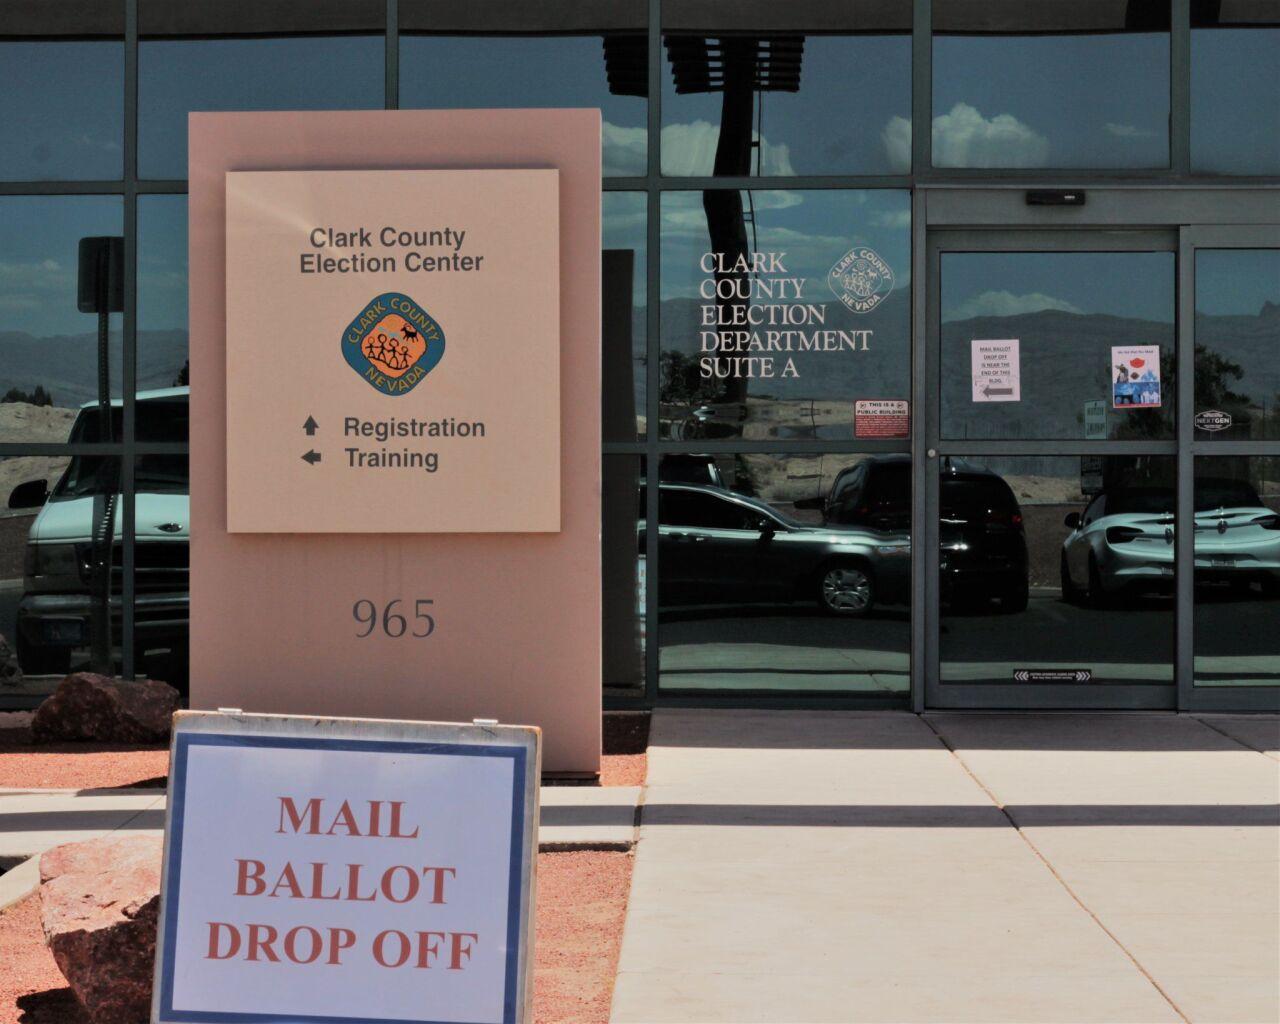 mail ballot dropoff SOURCE Clark County.jpeg